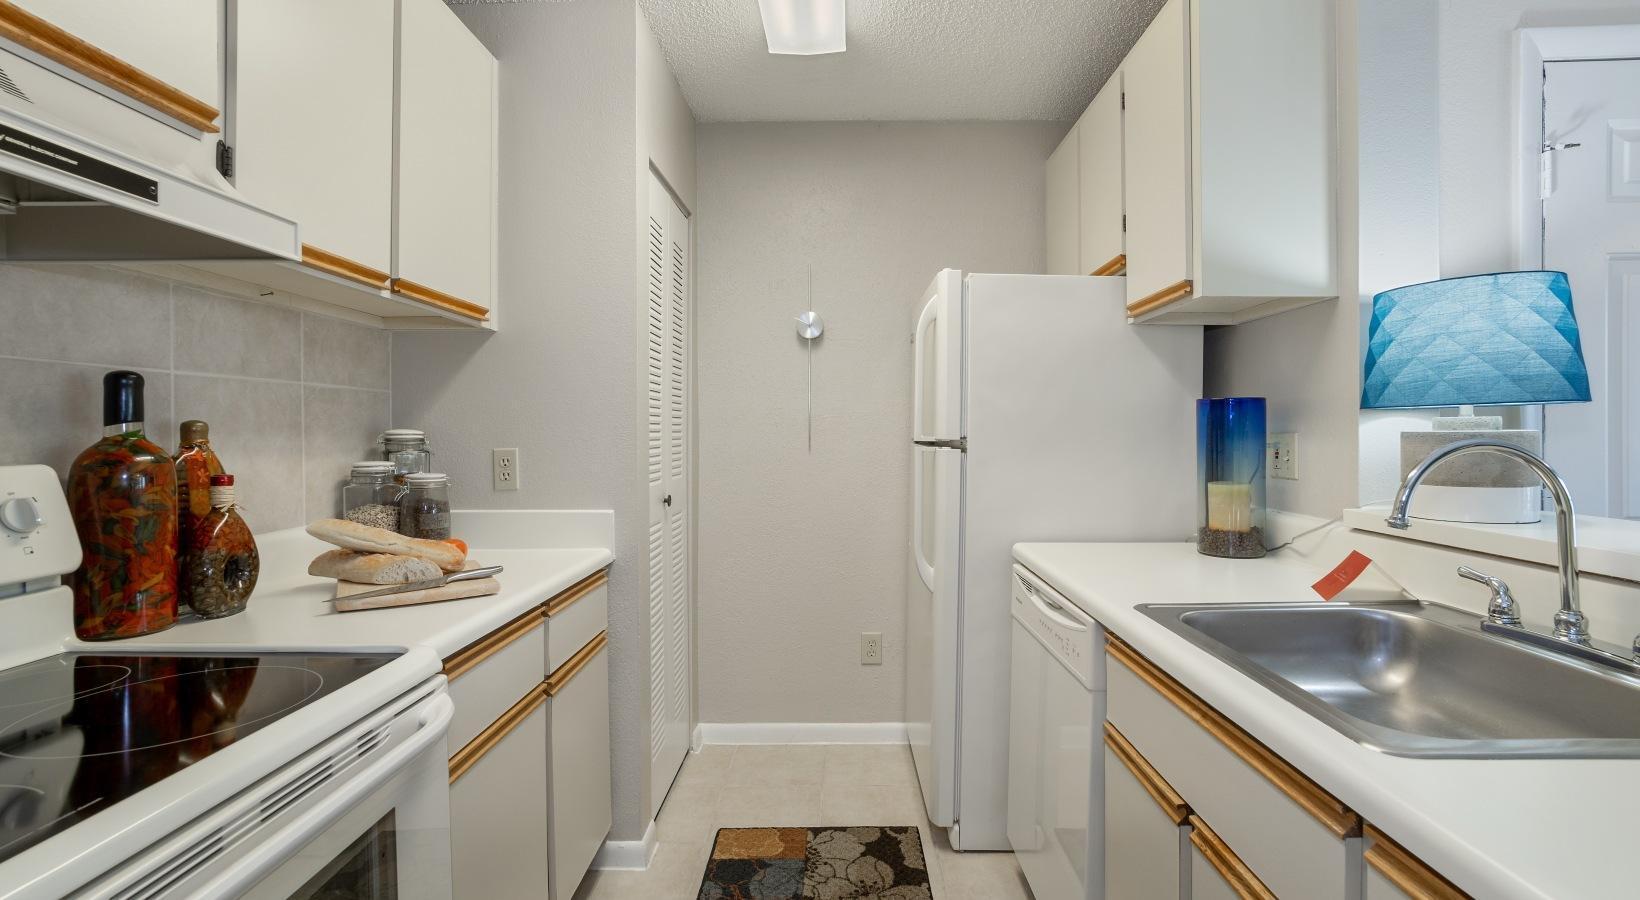 520 Terraceview Cove #14-304, Altamonte Springs, FL - 1,753 USD/ month